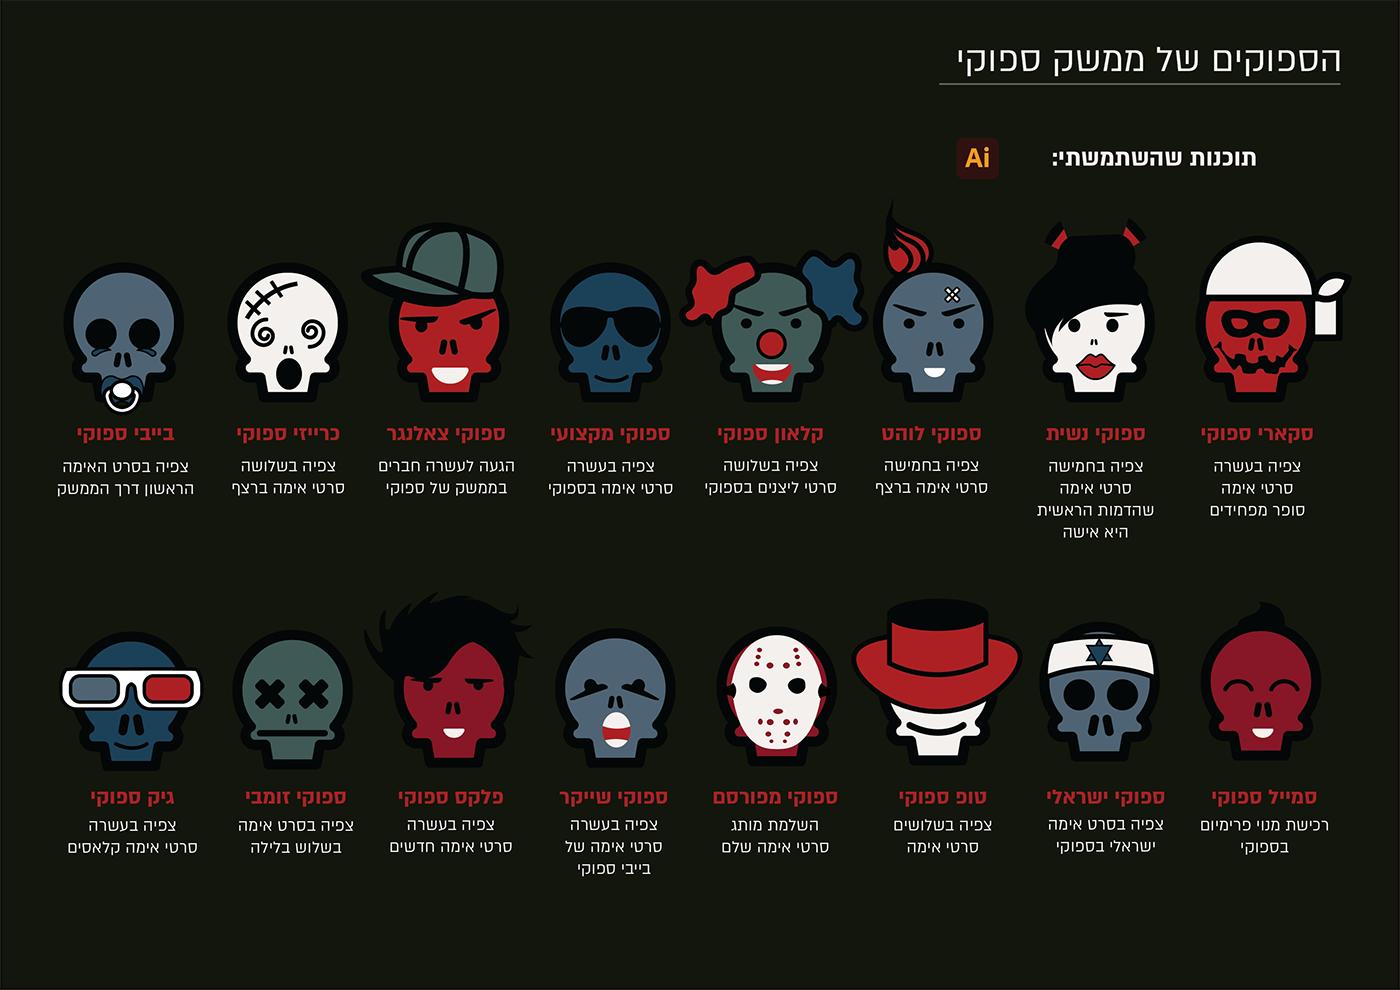 horror Horror Movies LIRON ZISKIND spooky Spooky Liron Ziskind UX UI wizo